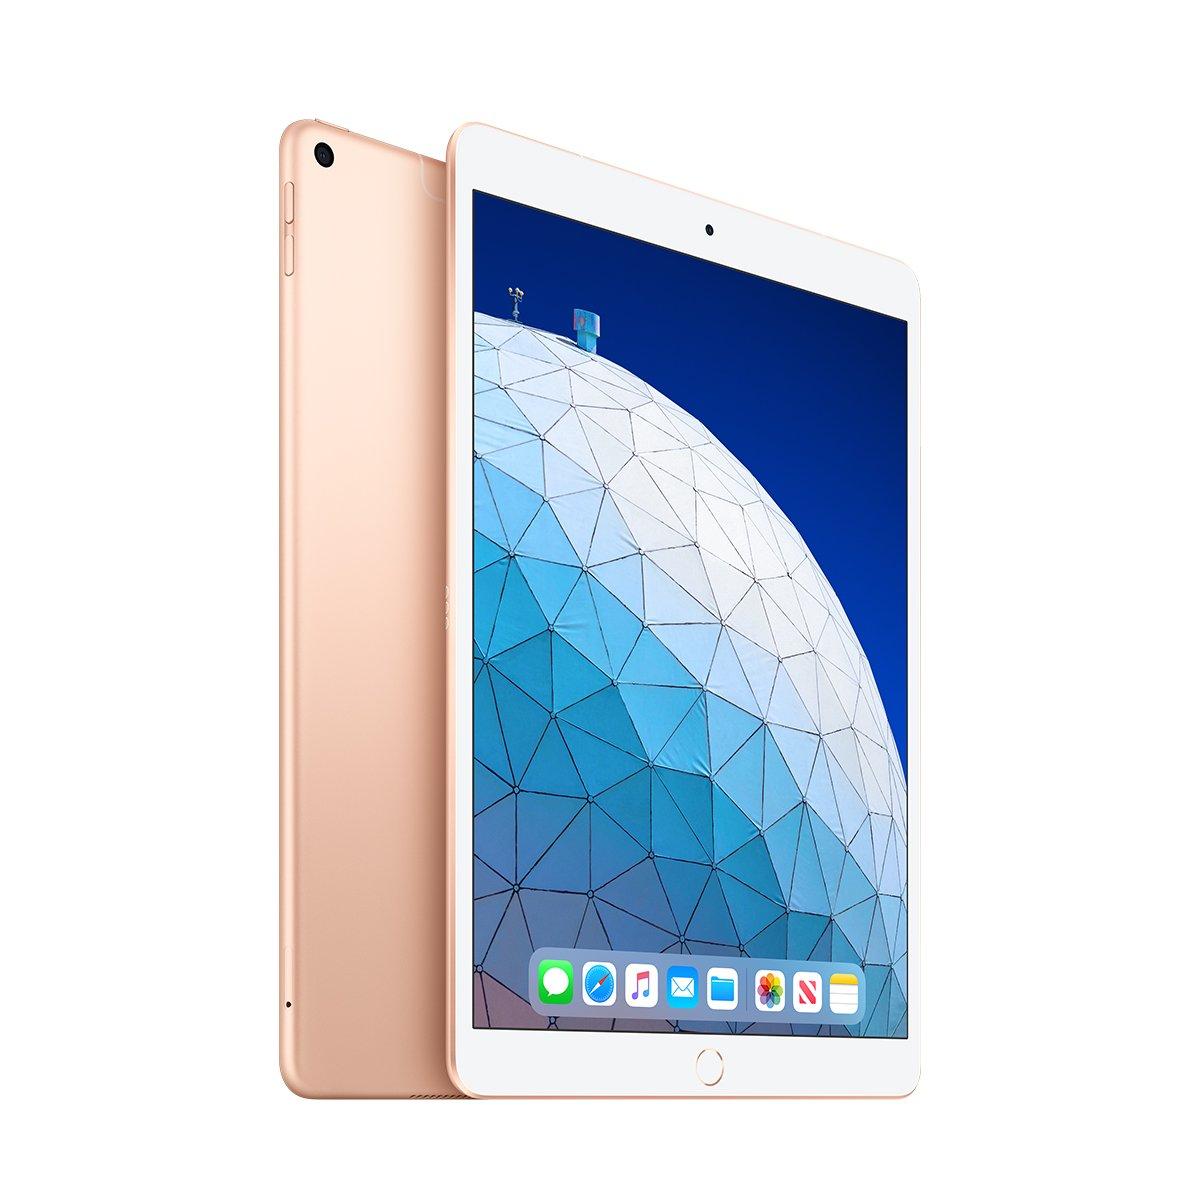 iPad Air3세대 256GB 골드 셀룰러MV0Q2KH/A, 단일상품